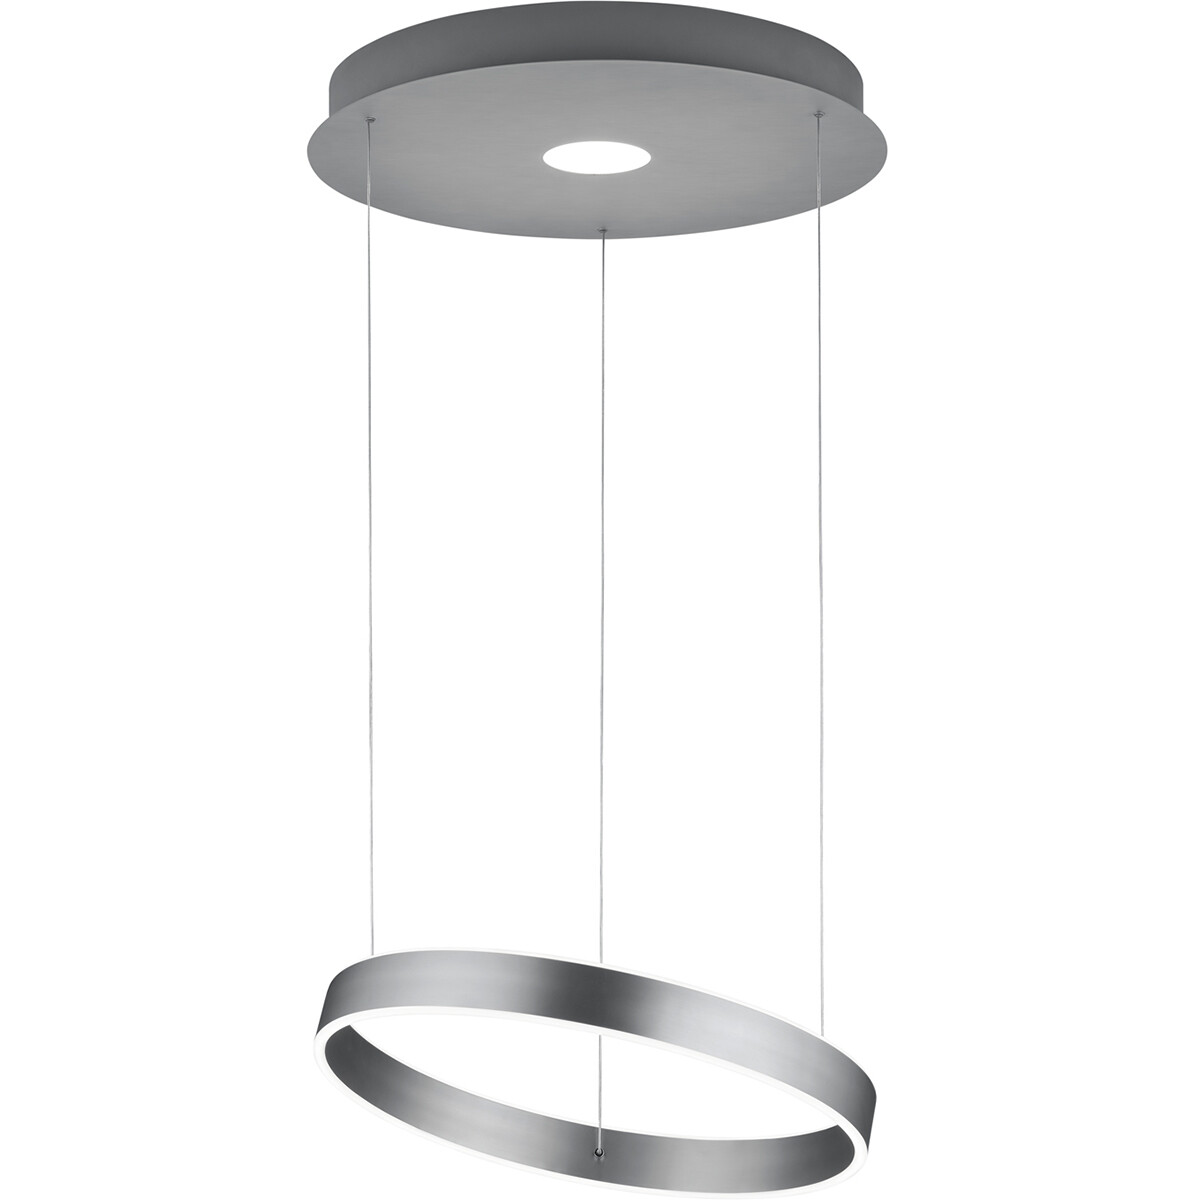 LED Hanglamp - Hangverlichting - Trion Lonag - 45W - Warm Wit 3000K - Rond - Mat Nikkel - Aluminium